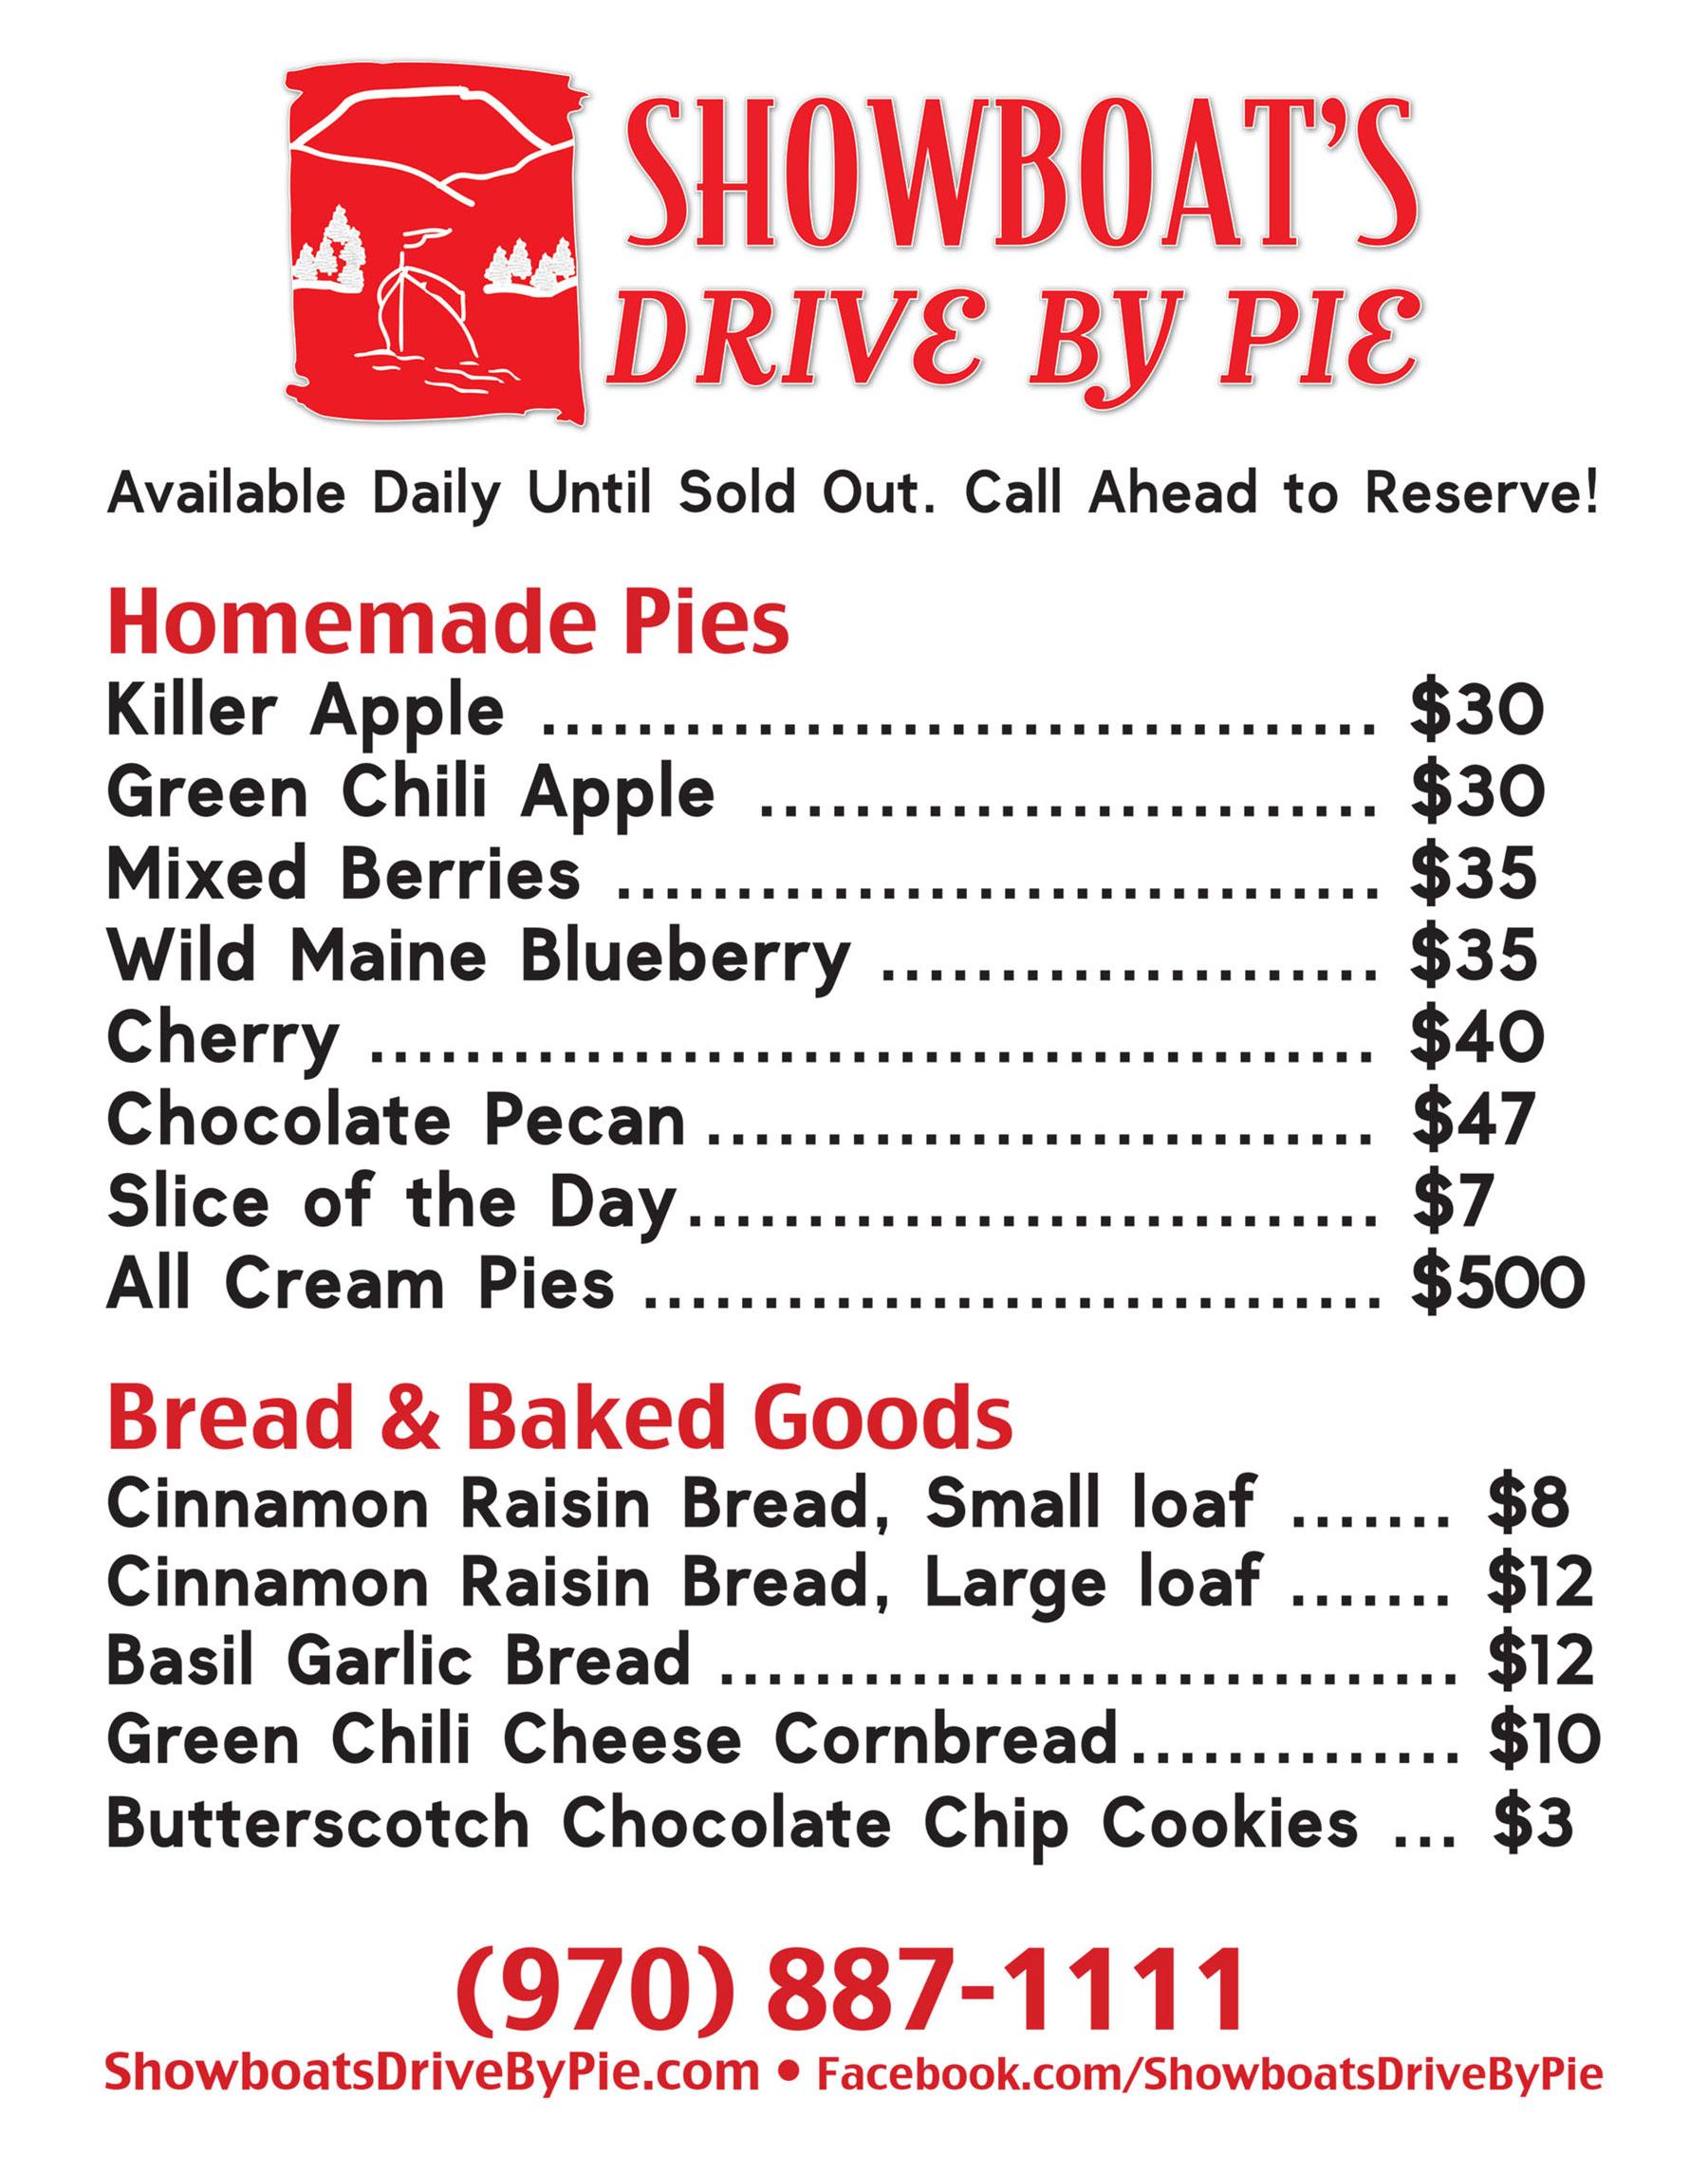 Showboat's Drive By Pie Menu